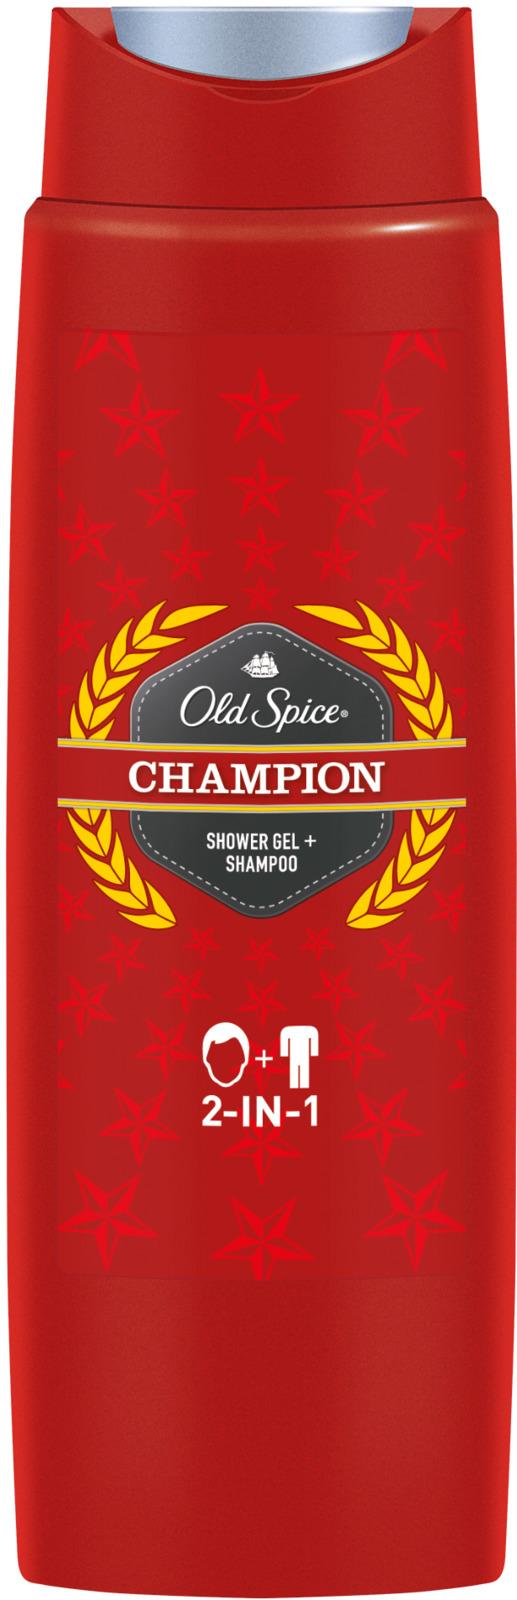 Гель для душа + Шампунь Old Spice 2в1 Champion, 250 мл